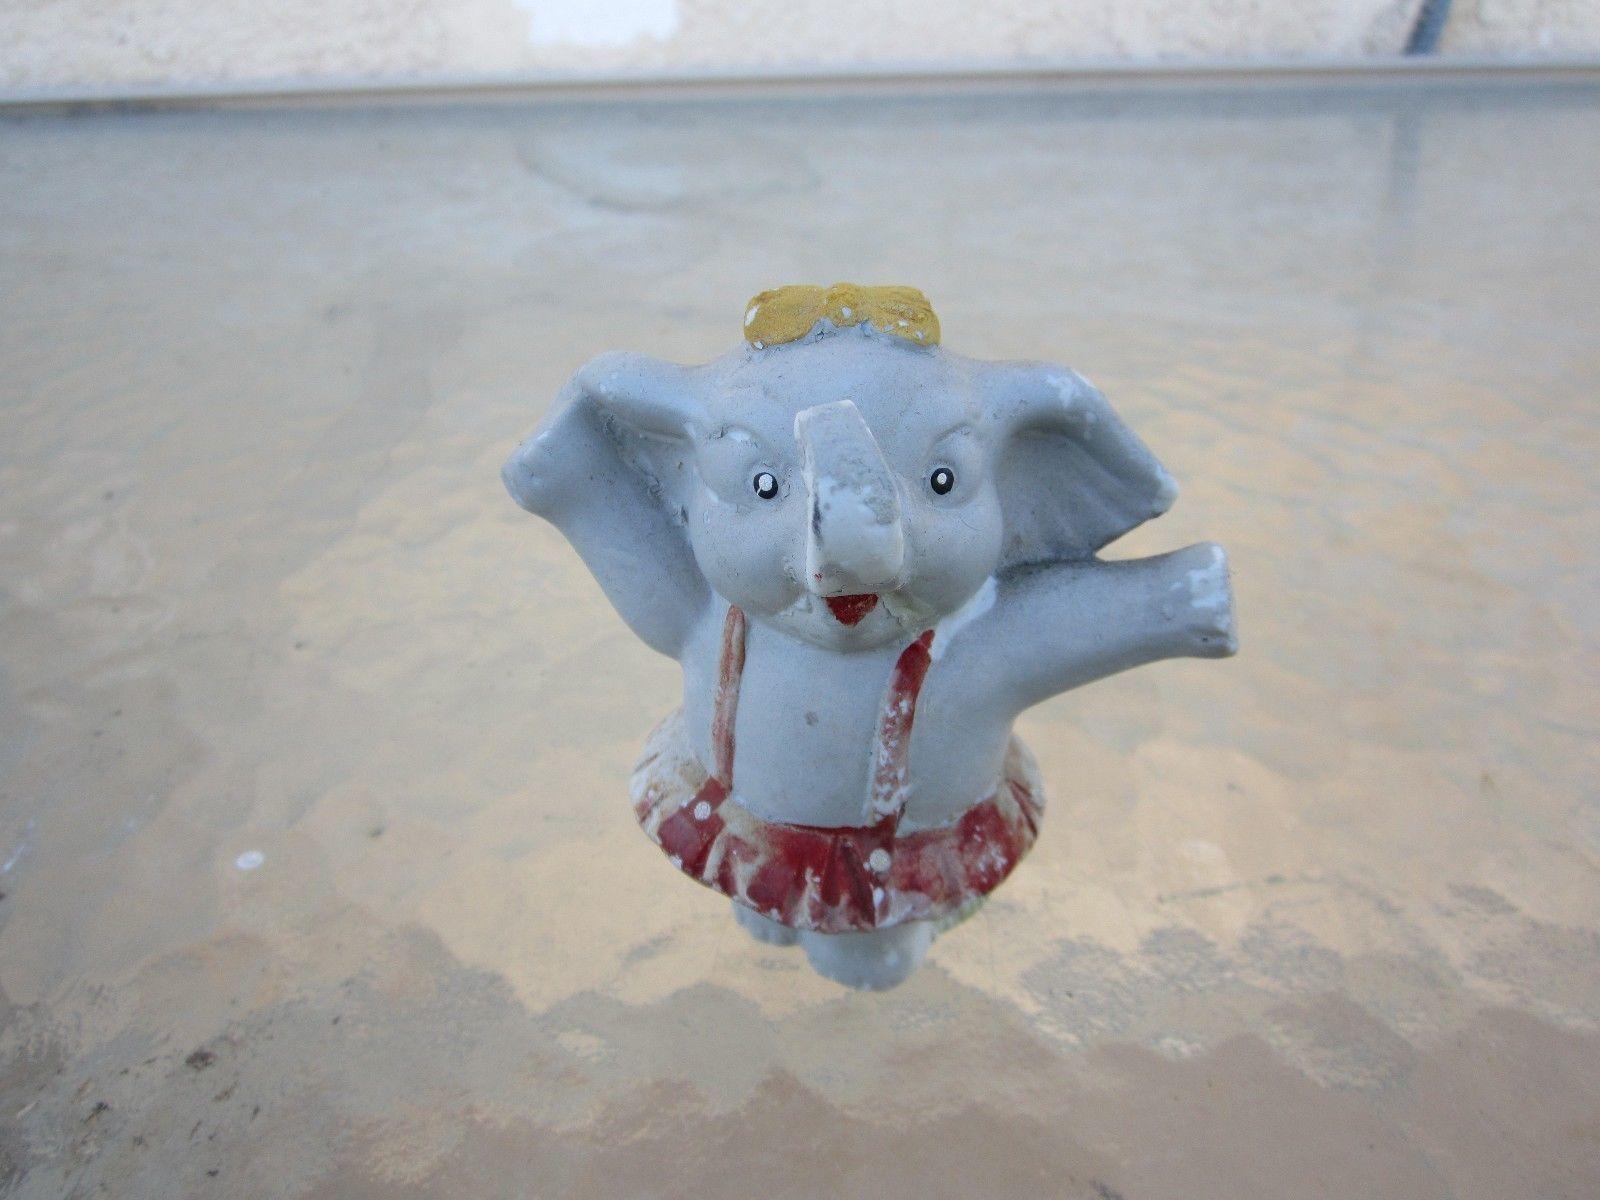 elephant figurine miniature elephant decorative figurine elephant home decor 21 figurines. Black Bedroom Furniture Sets. Home Design Ideas